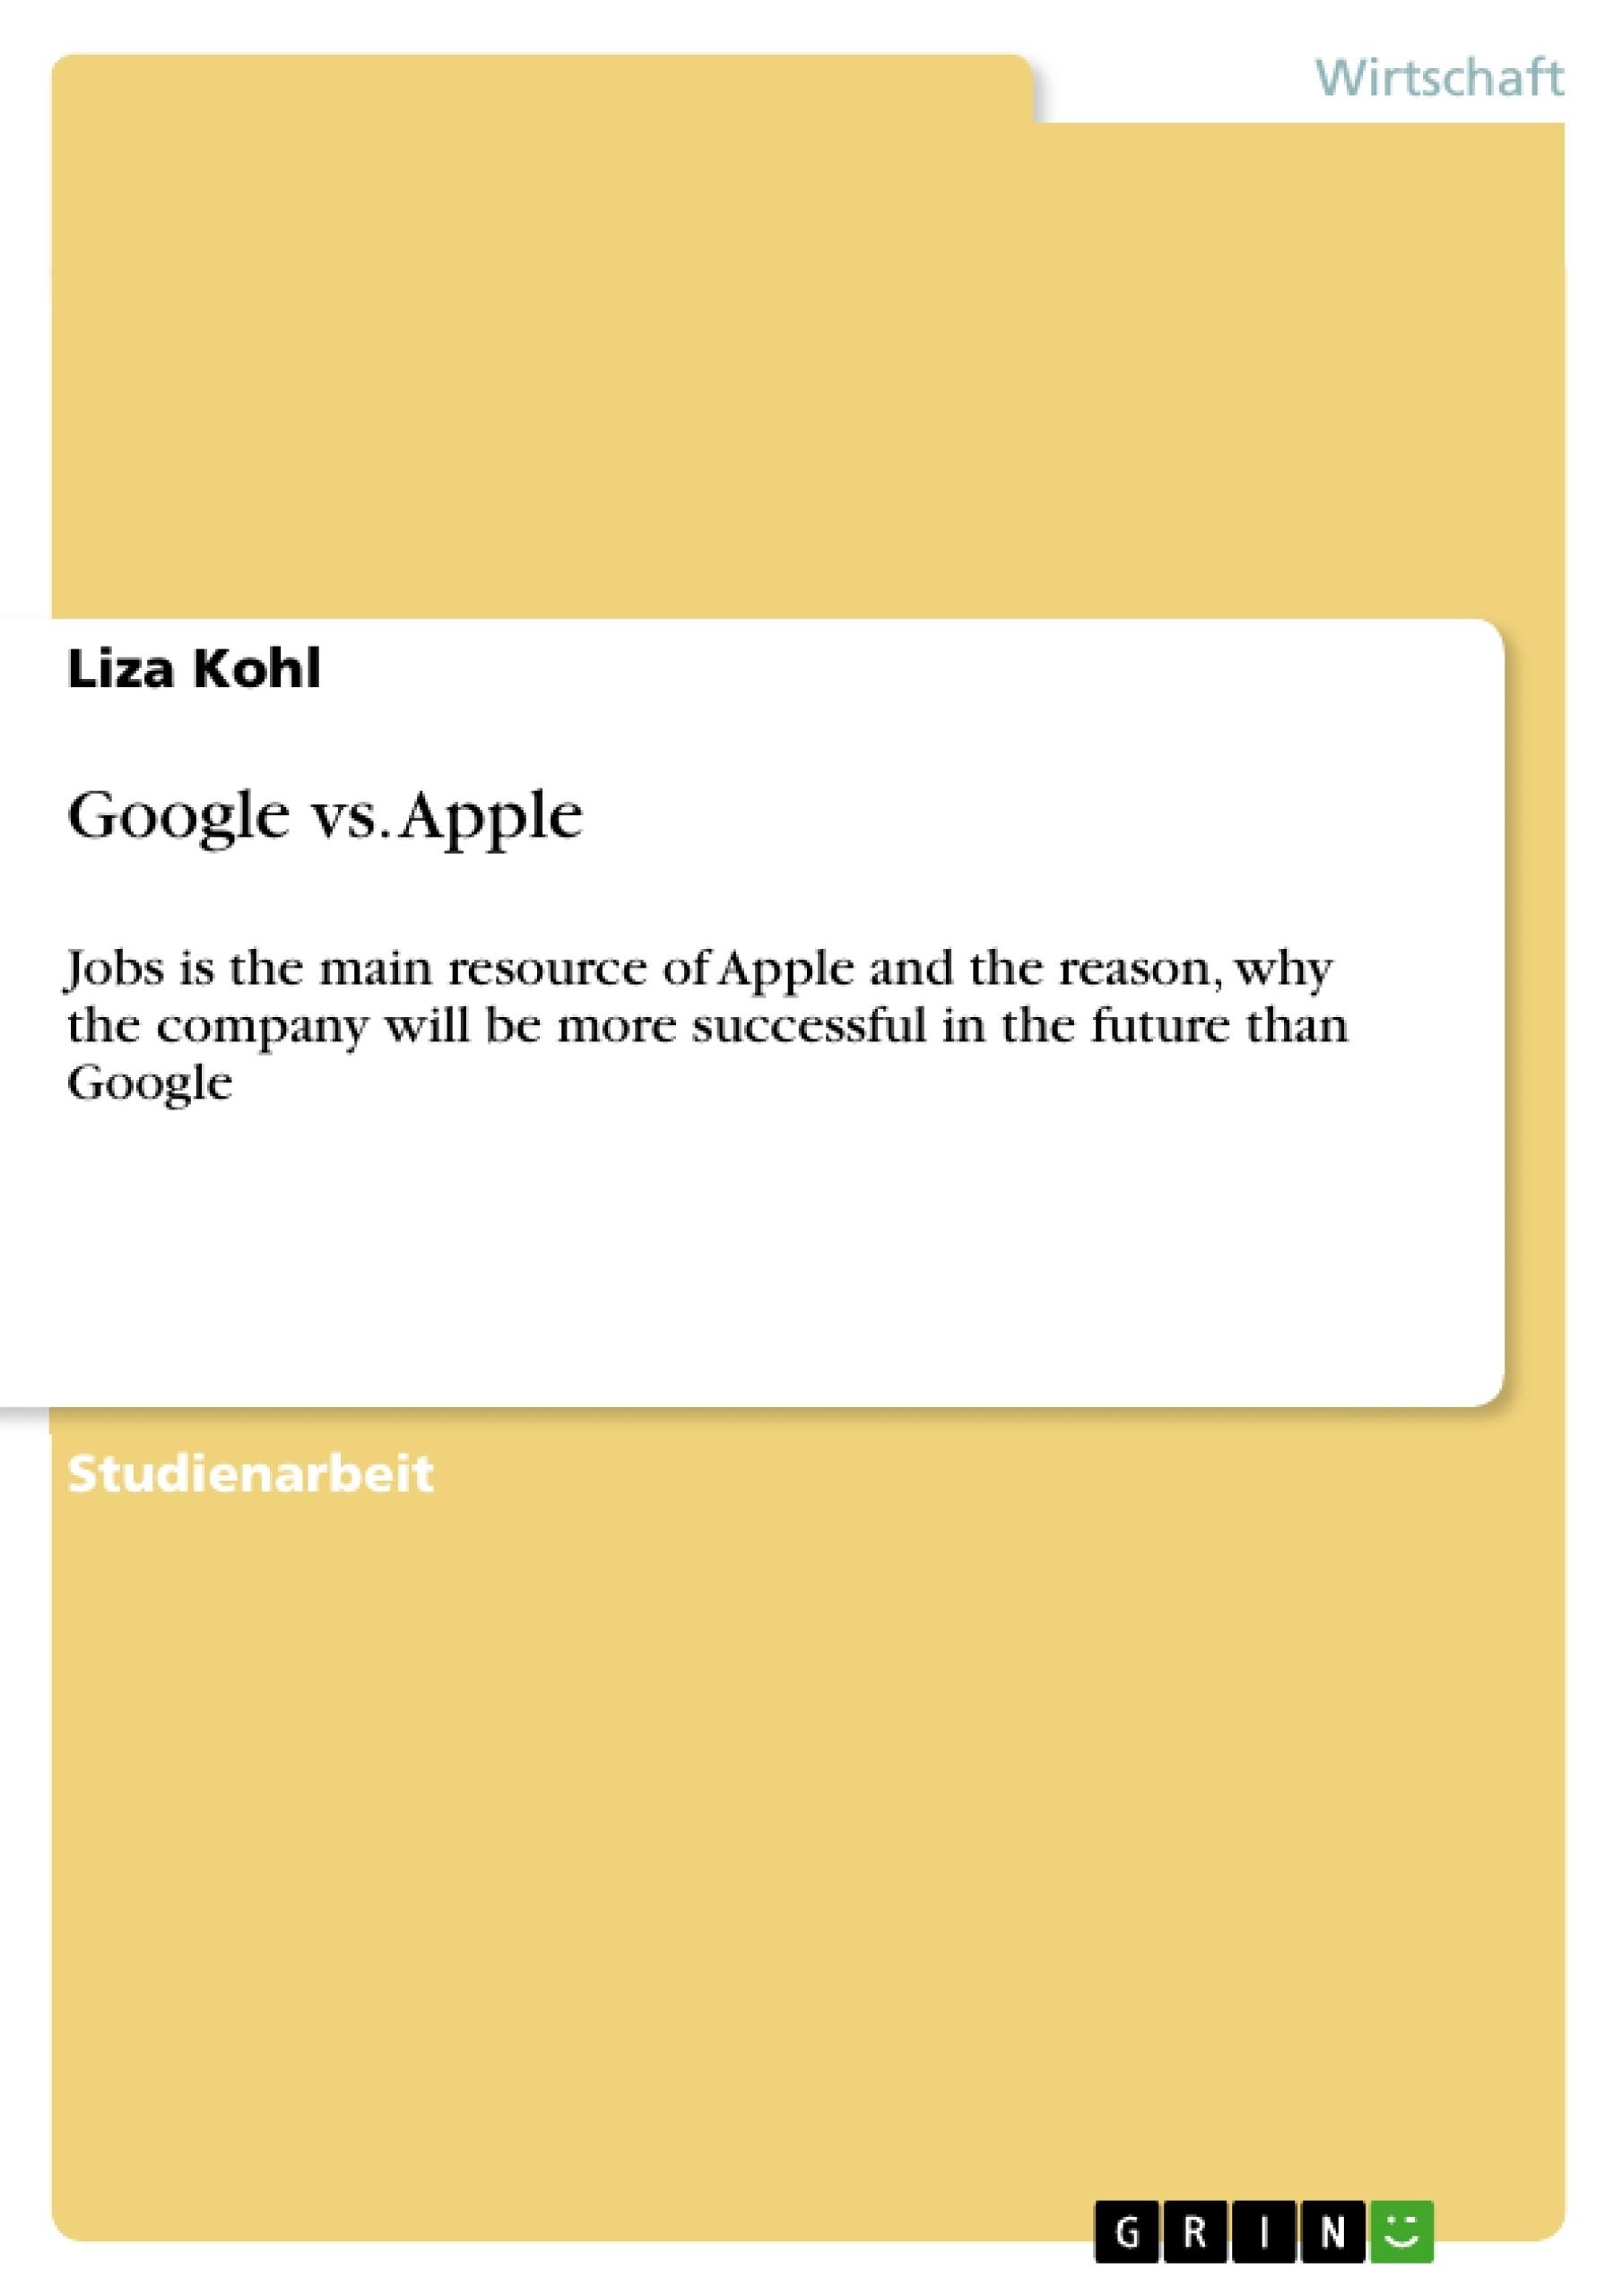 Titel: Google vs. Apple